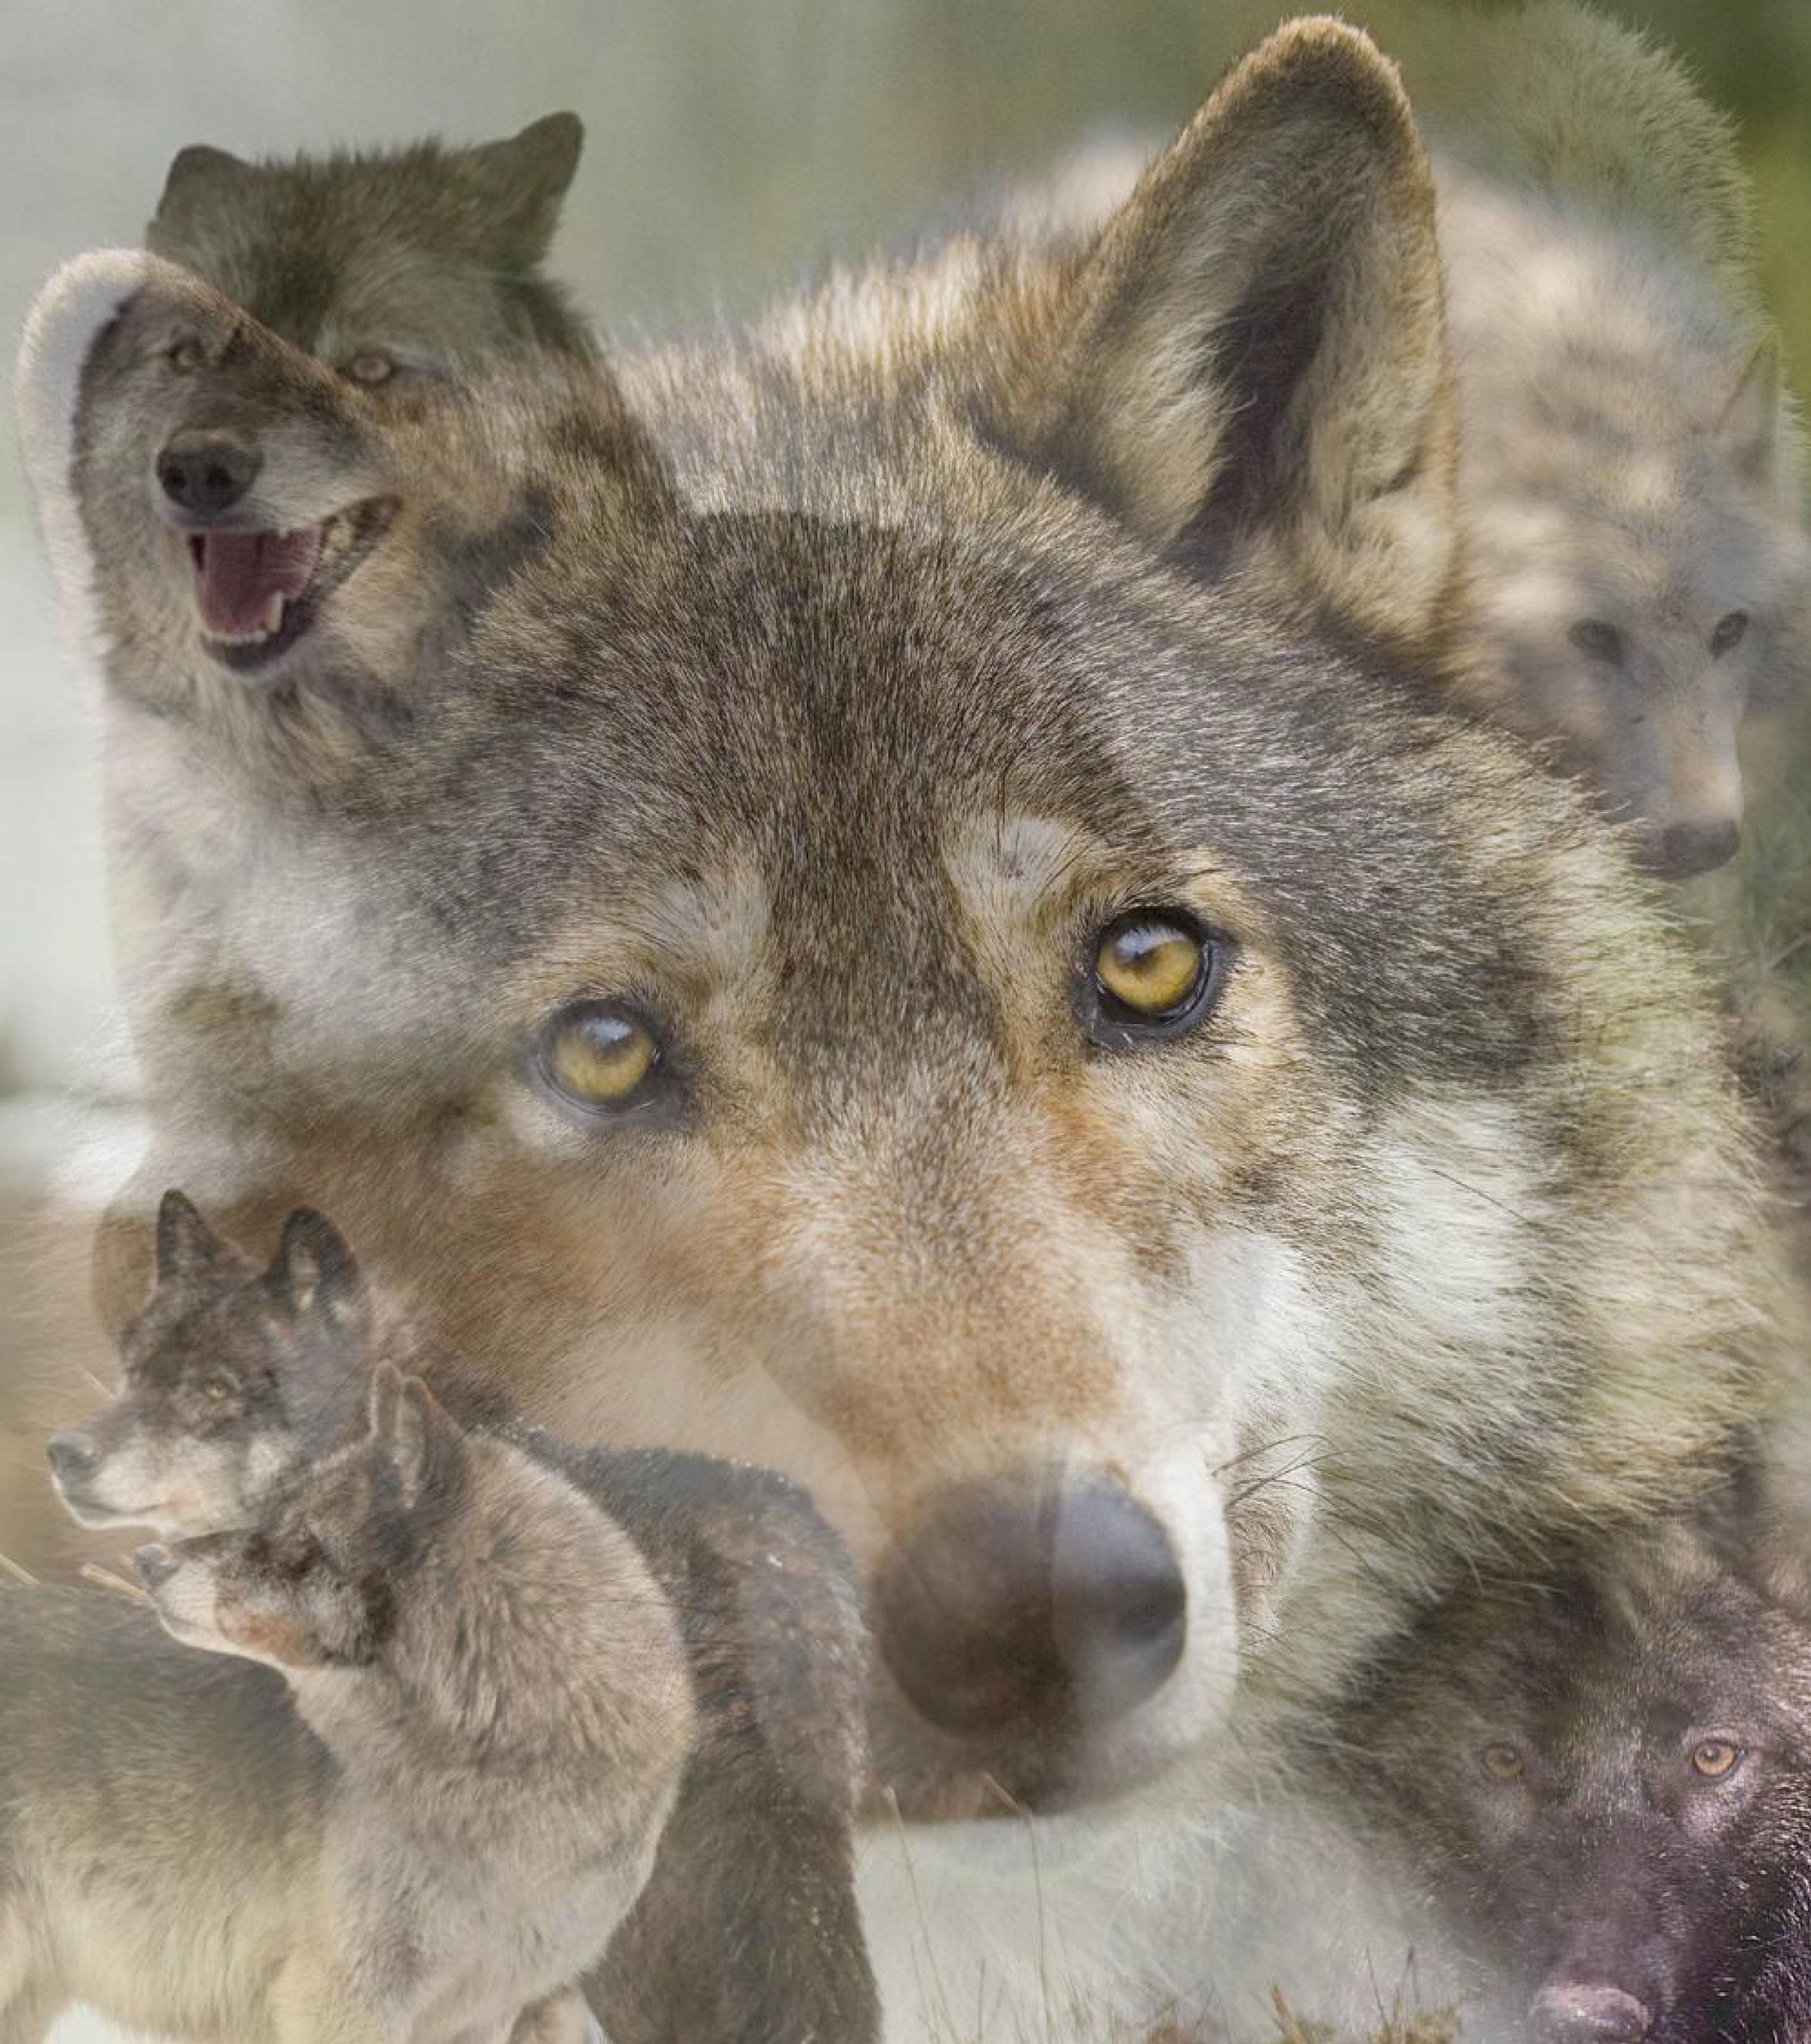 Lone-Wolf-Image.jpg